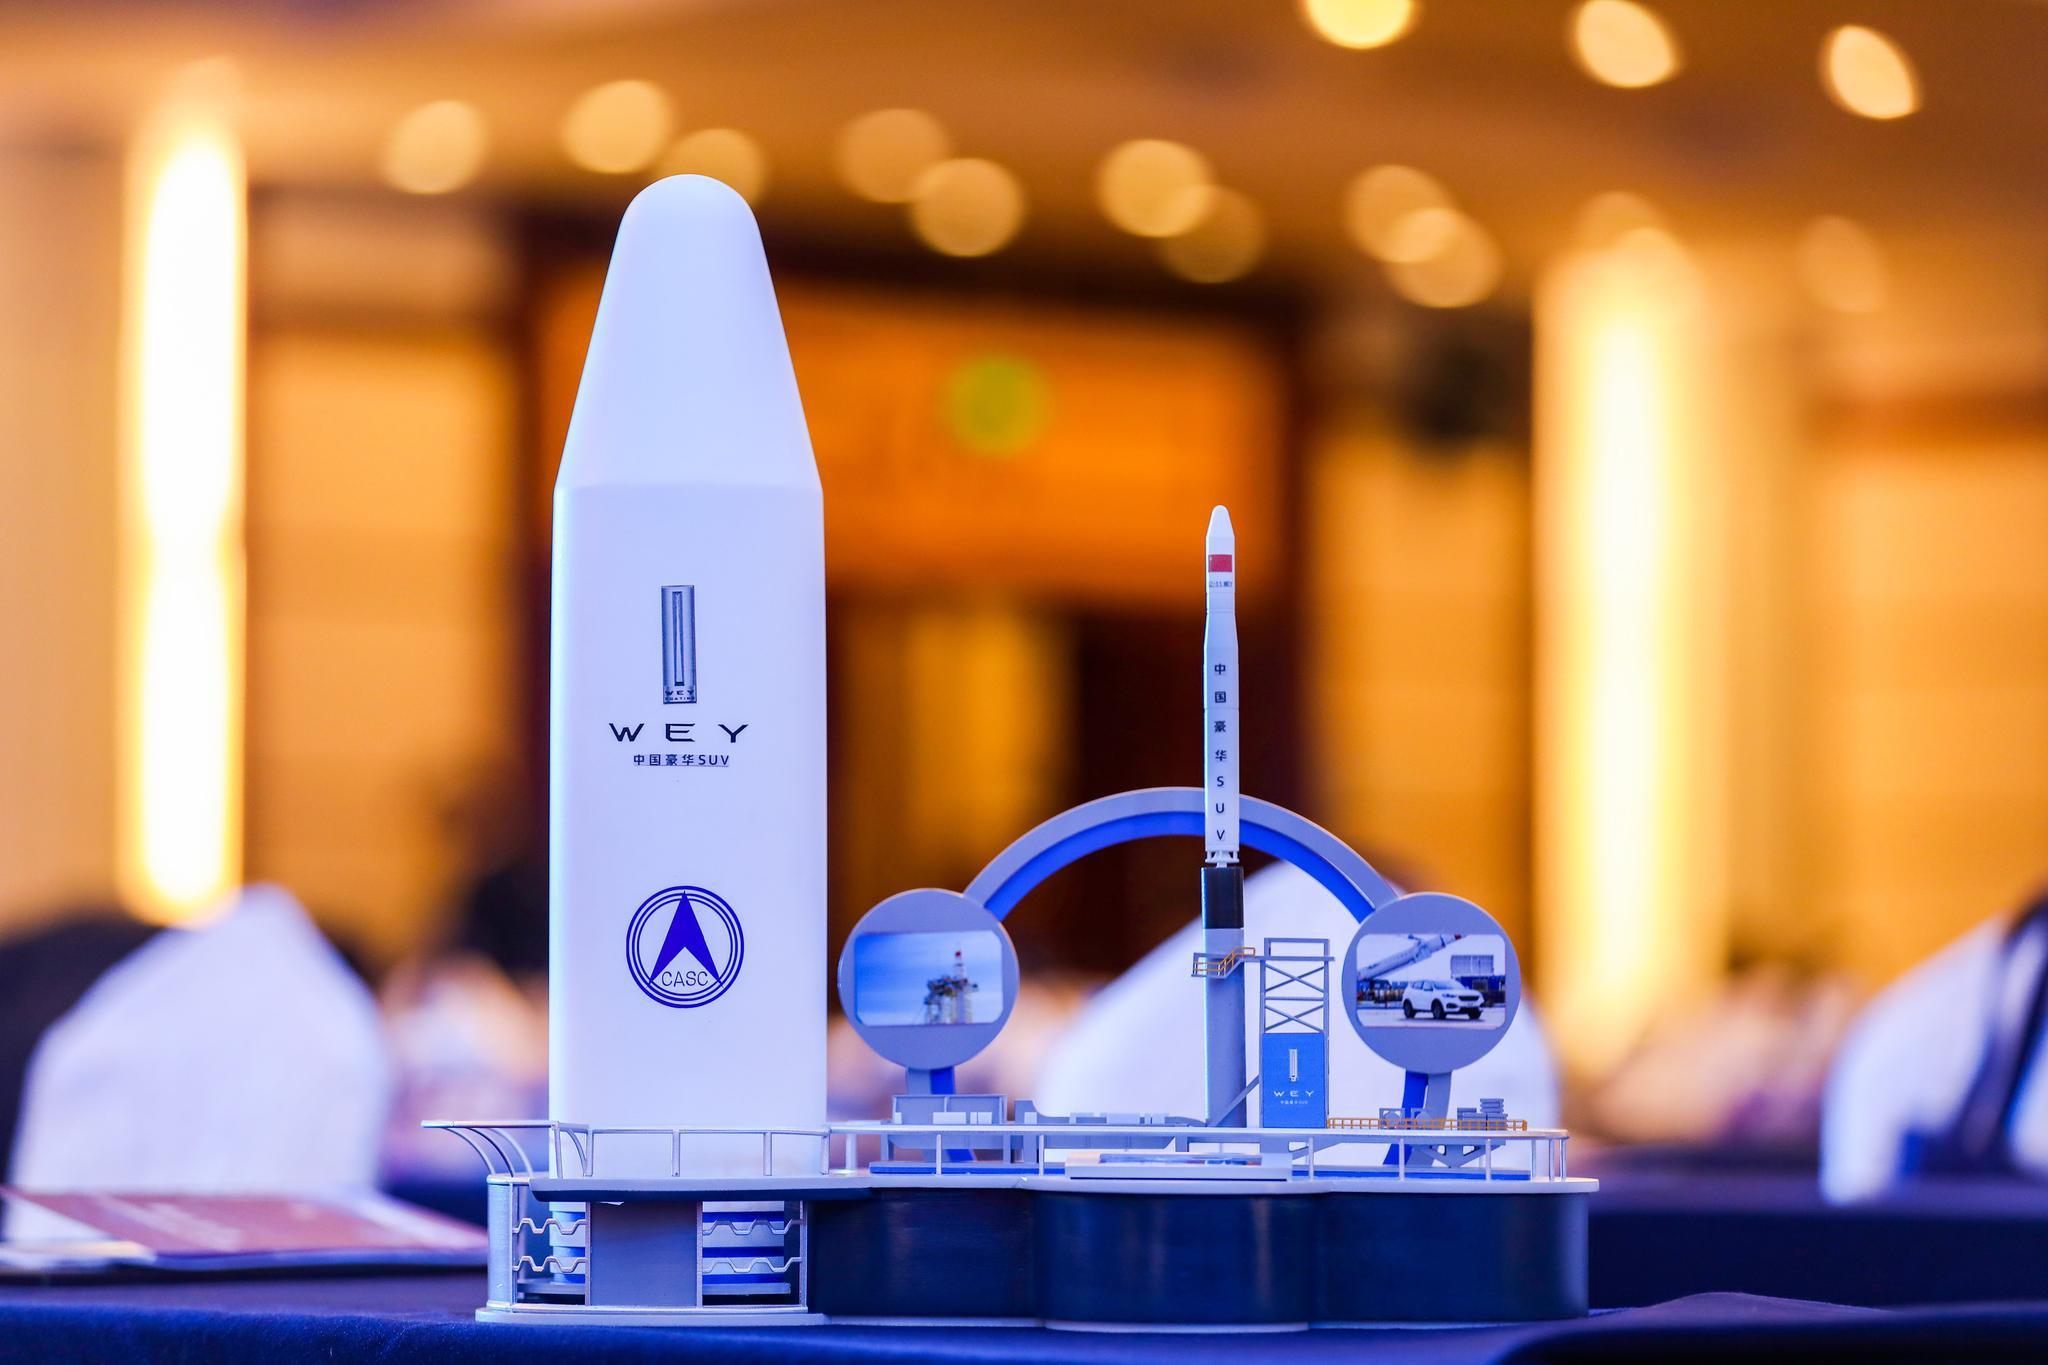 WEY品牌与中国航天基金会联合捐赠火箭模型及残骸